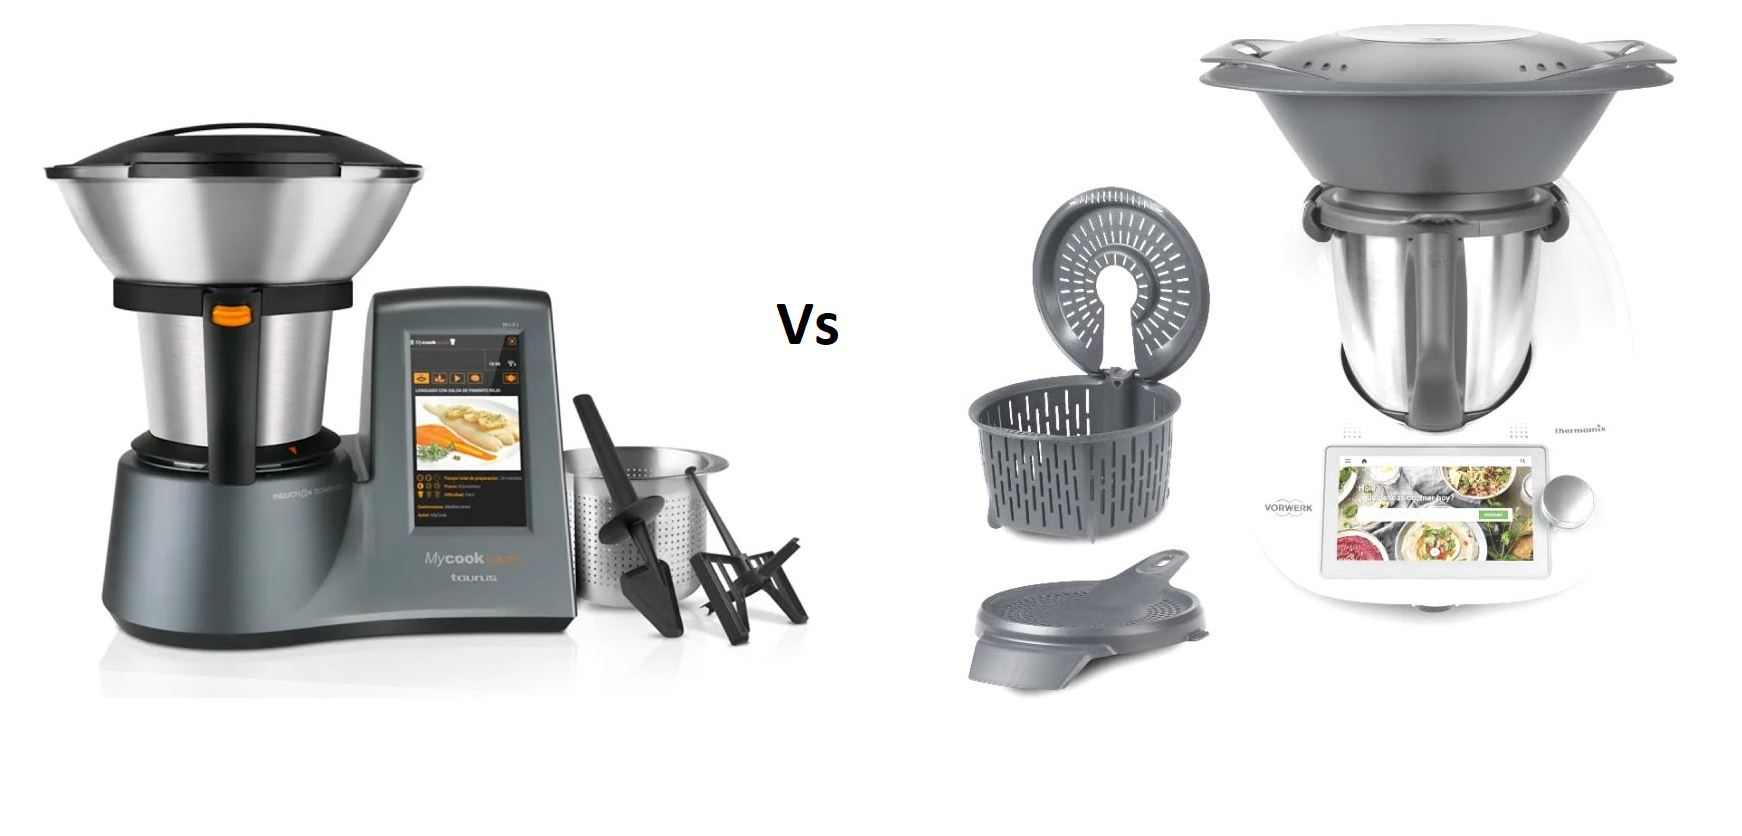 MyCook Touch Vs Thermomix ¿Cuál es mejor?